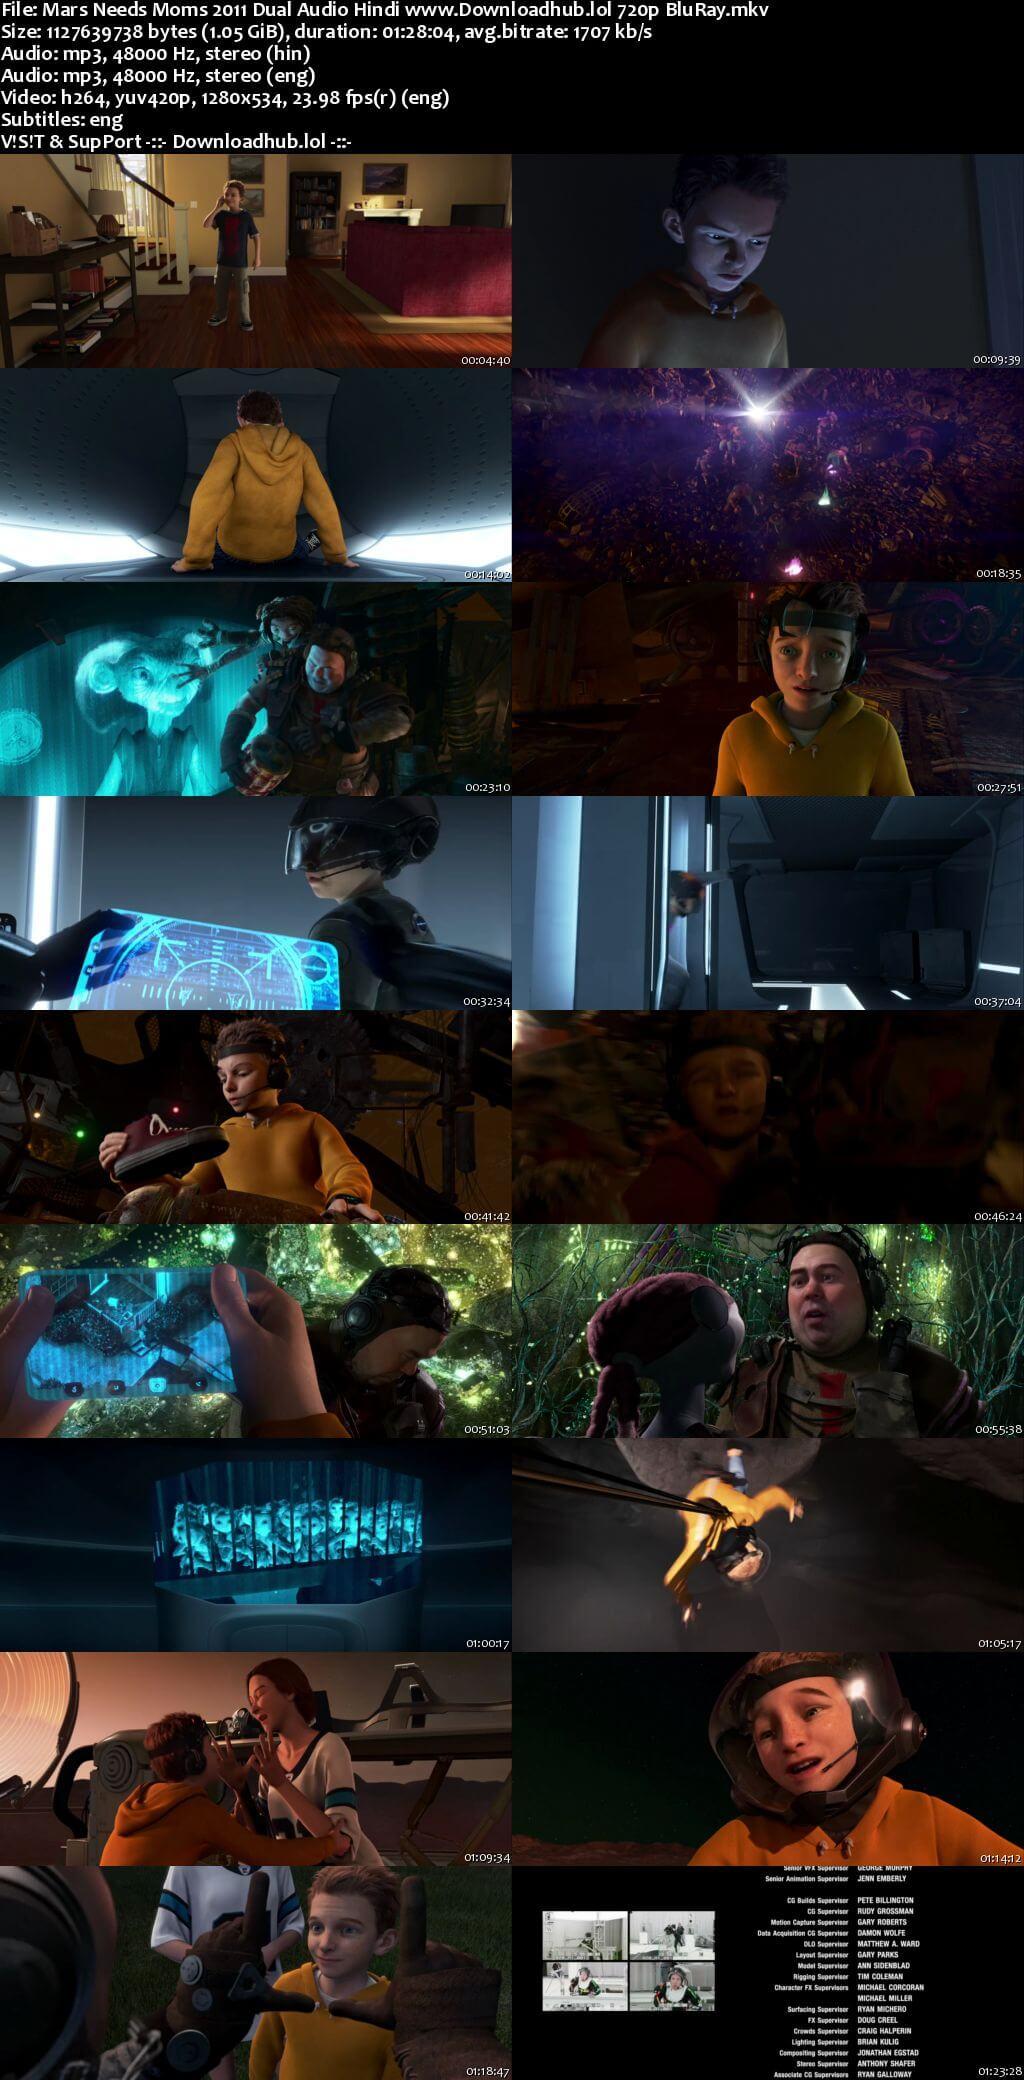 Mars Needs Moms 2011 Hindi Dual Audio 720p BluRay ESubs